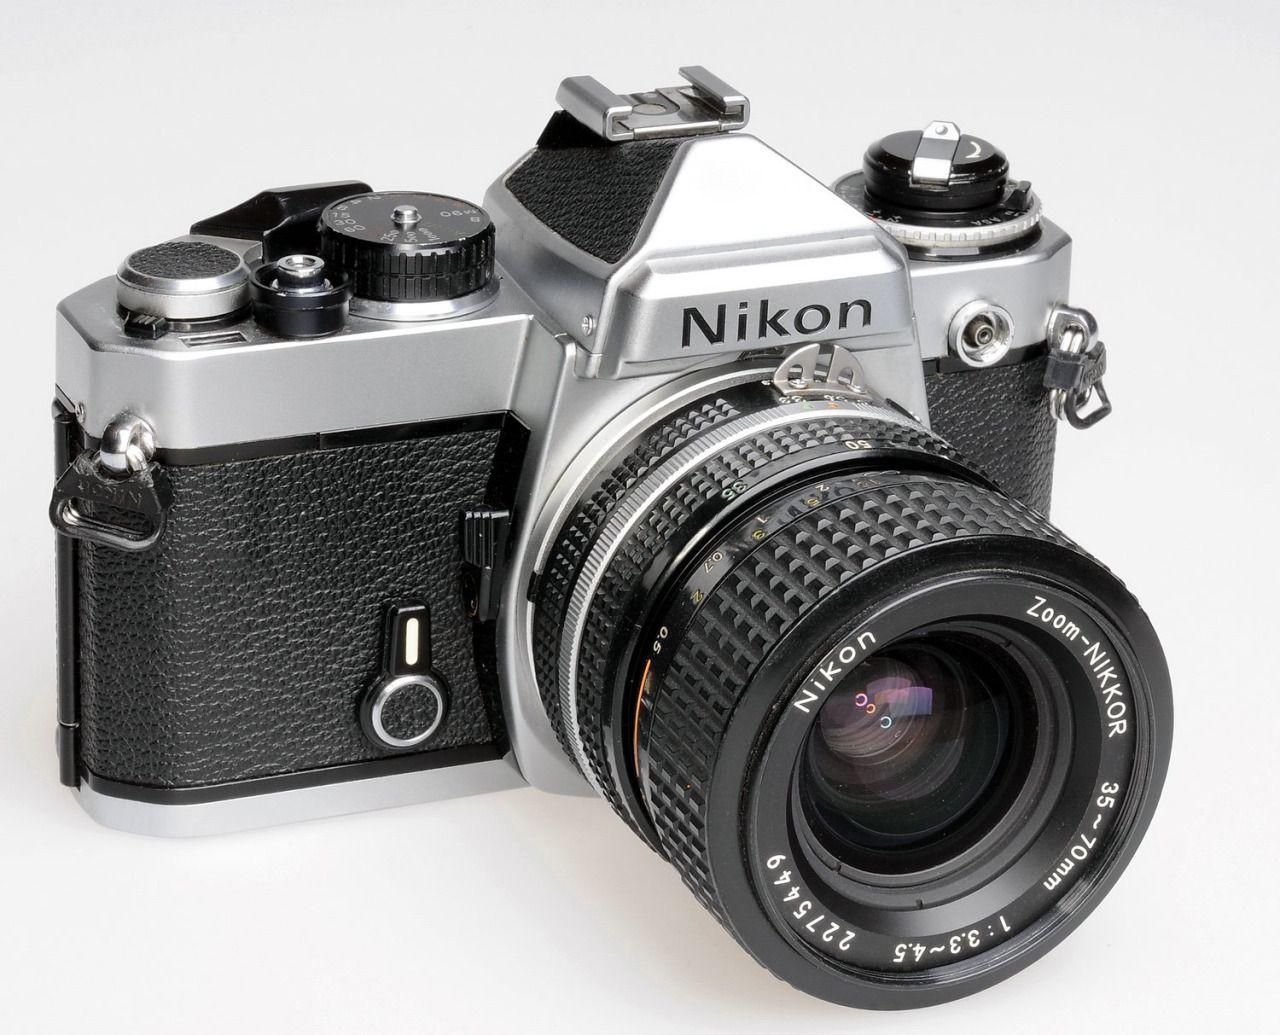 Nikon fm series best 35mm film camera vintage cameras antique cameras old cameras